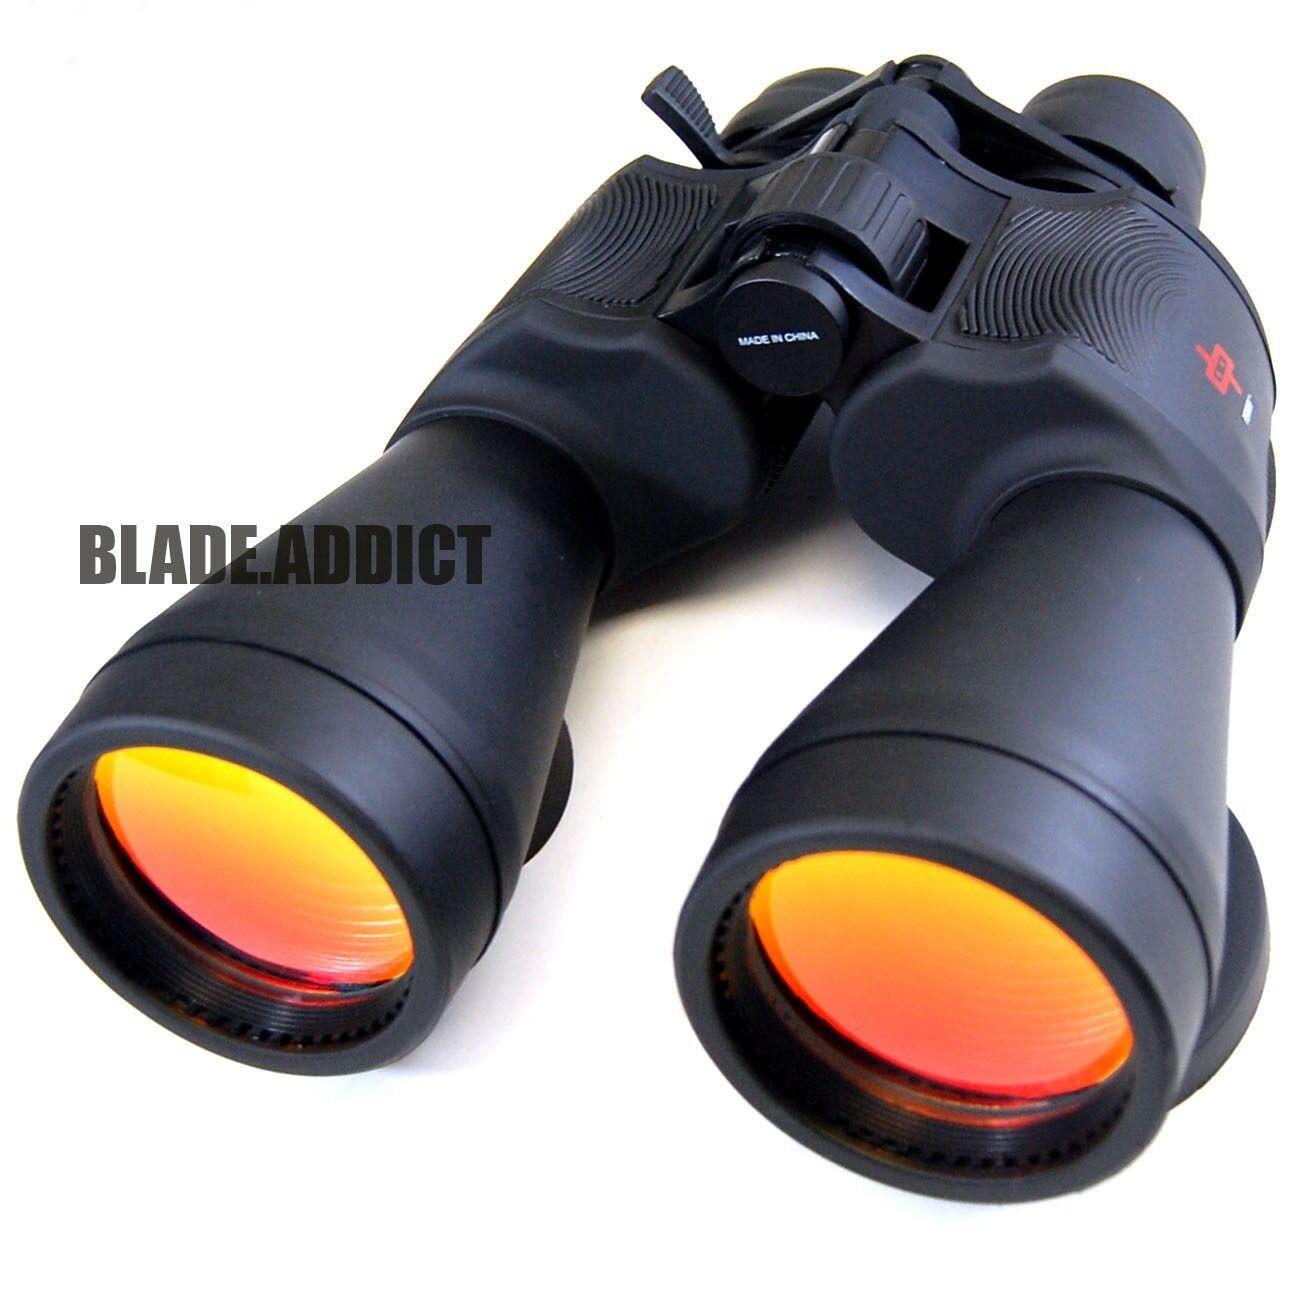 Day / Night 20-50x70 Military Zoom Powerful Binoculars Optics Hunting Camping